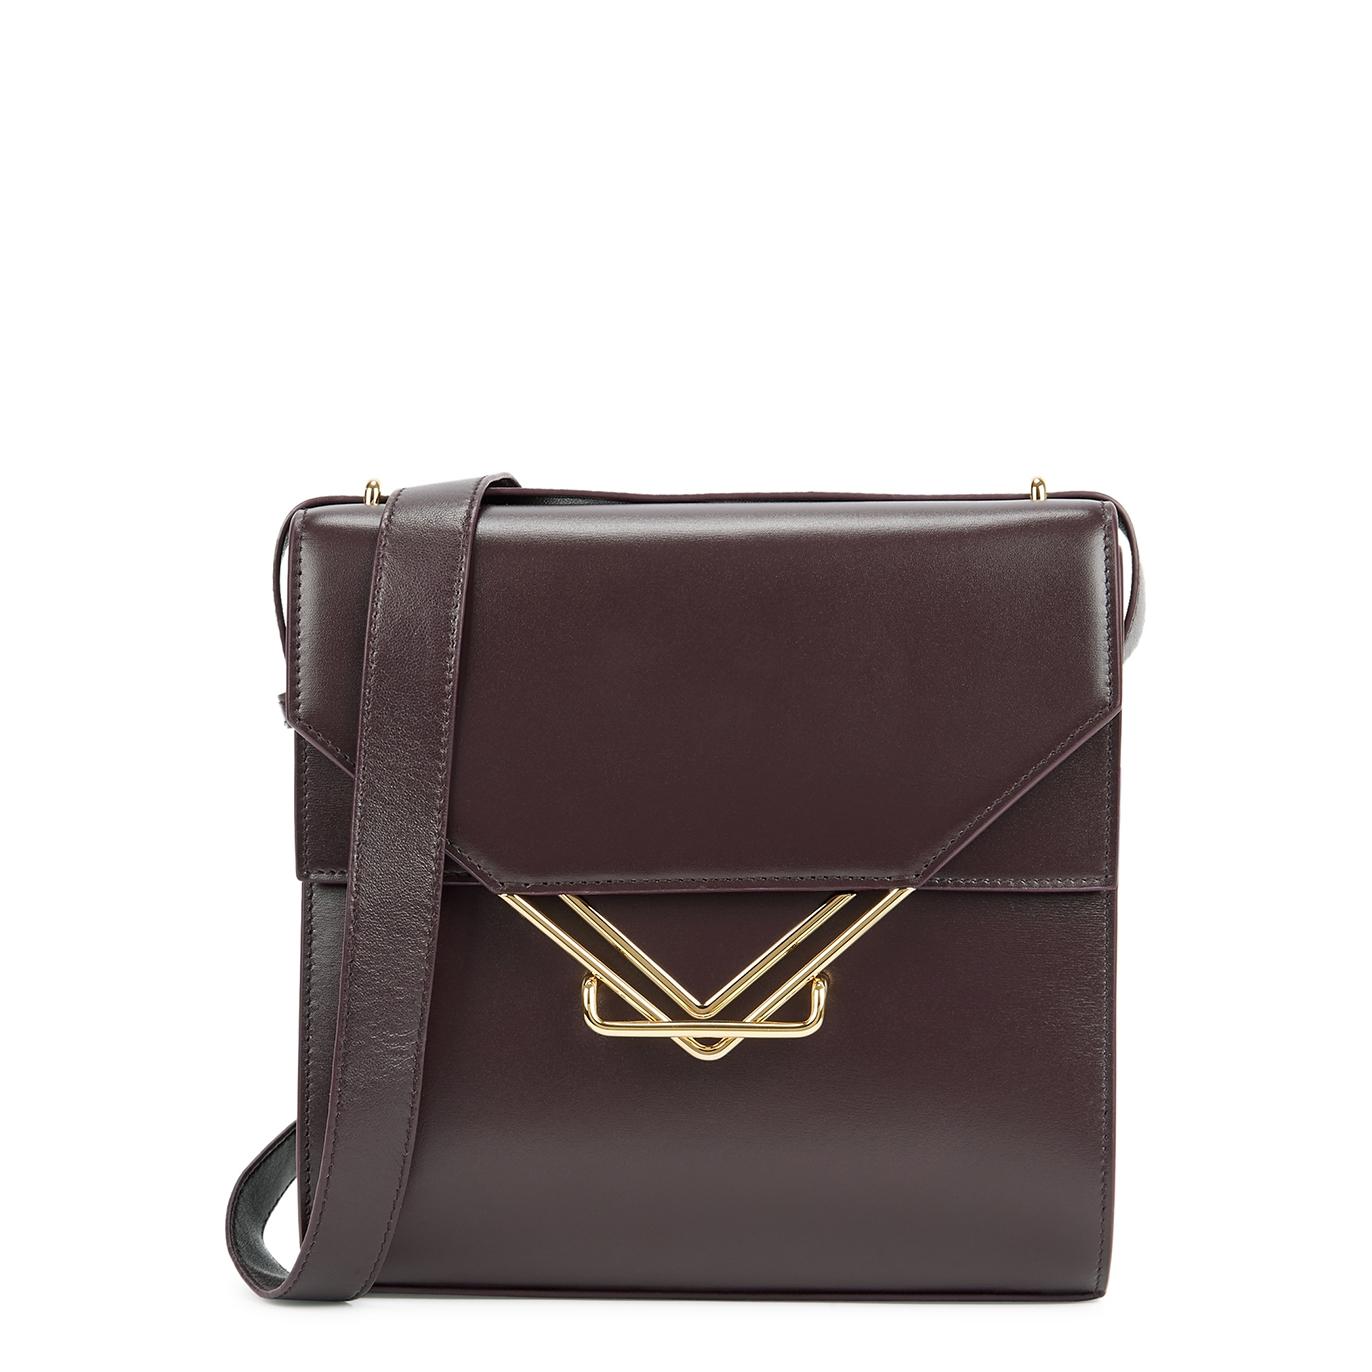 The Clip plum leather shoulder bag